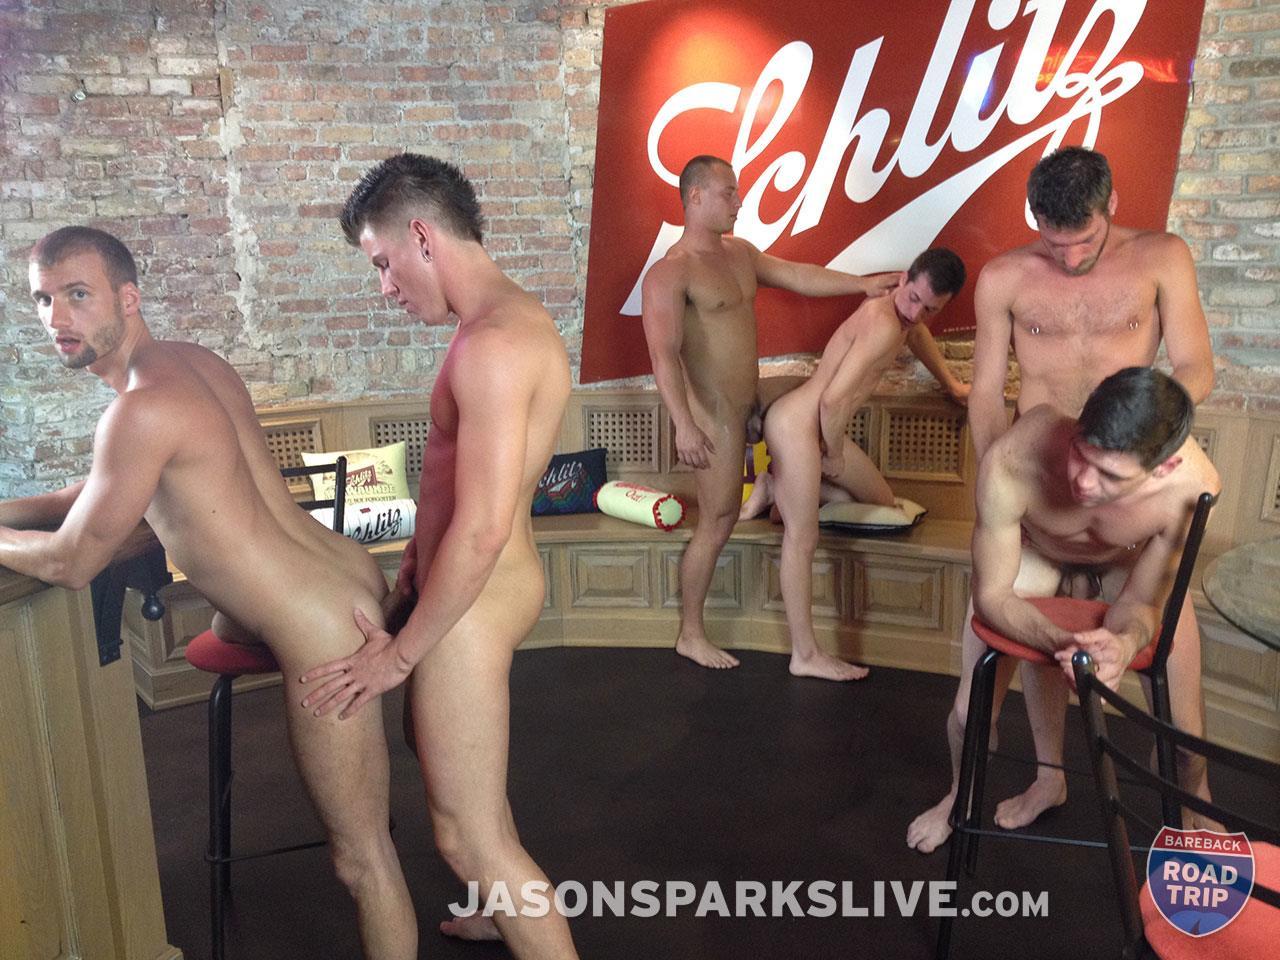 Jason-Sparks-Live-Dustin-Tyler-Shawn-Andrews-Brendon-Scott-Corbin-Riley-Antonio-Paul-Jake-Matthews-Bareback-Orgy-Amateur-Gay-Porn-12 Big Cock Amateur Bareback Orgy in Milwaukee